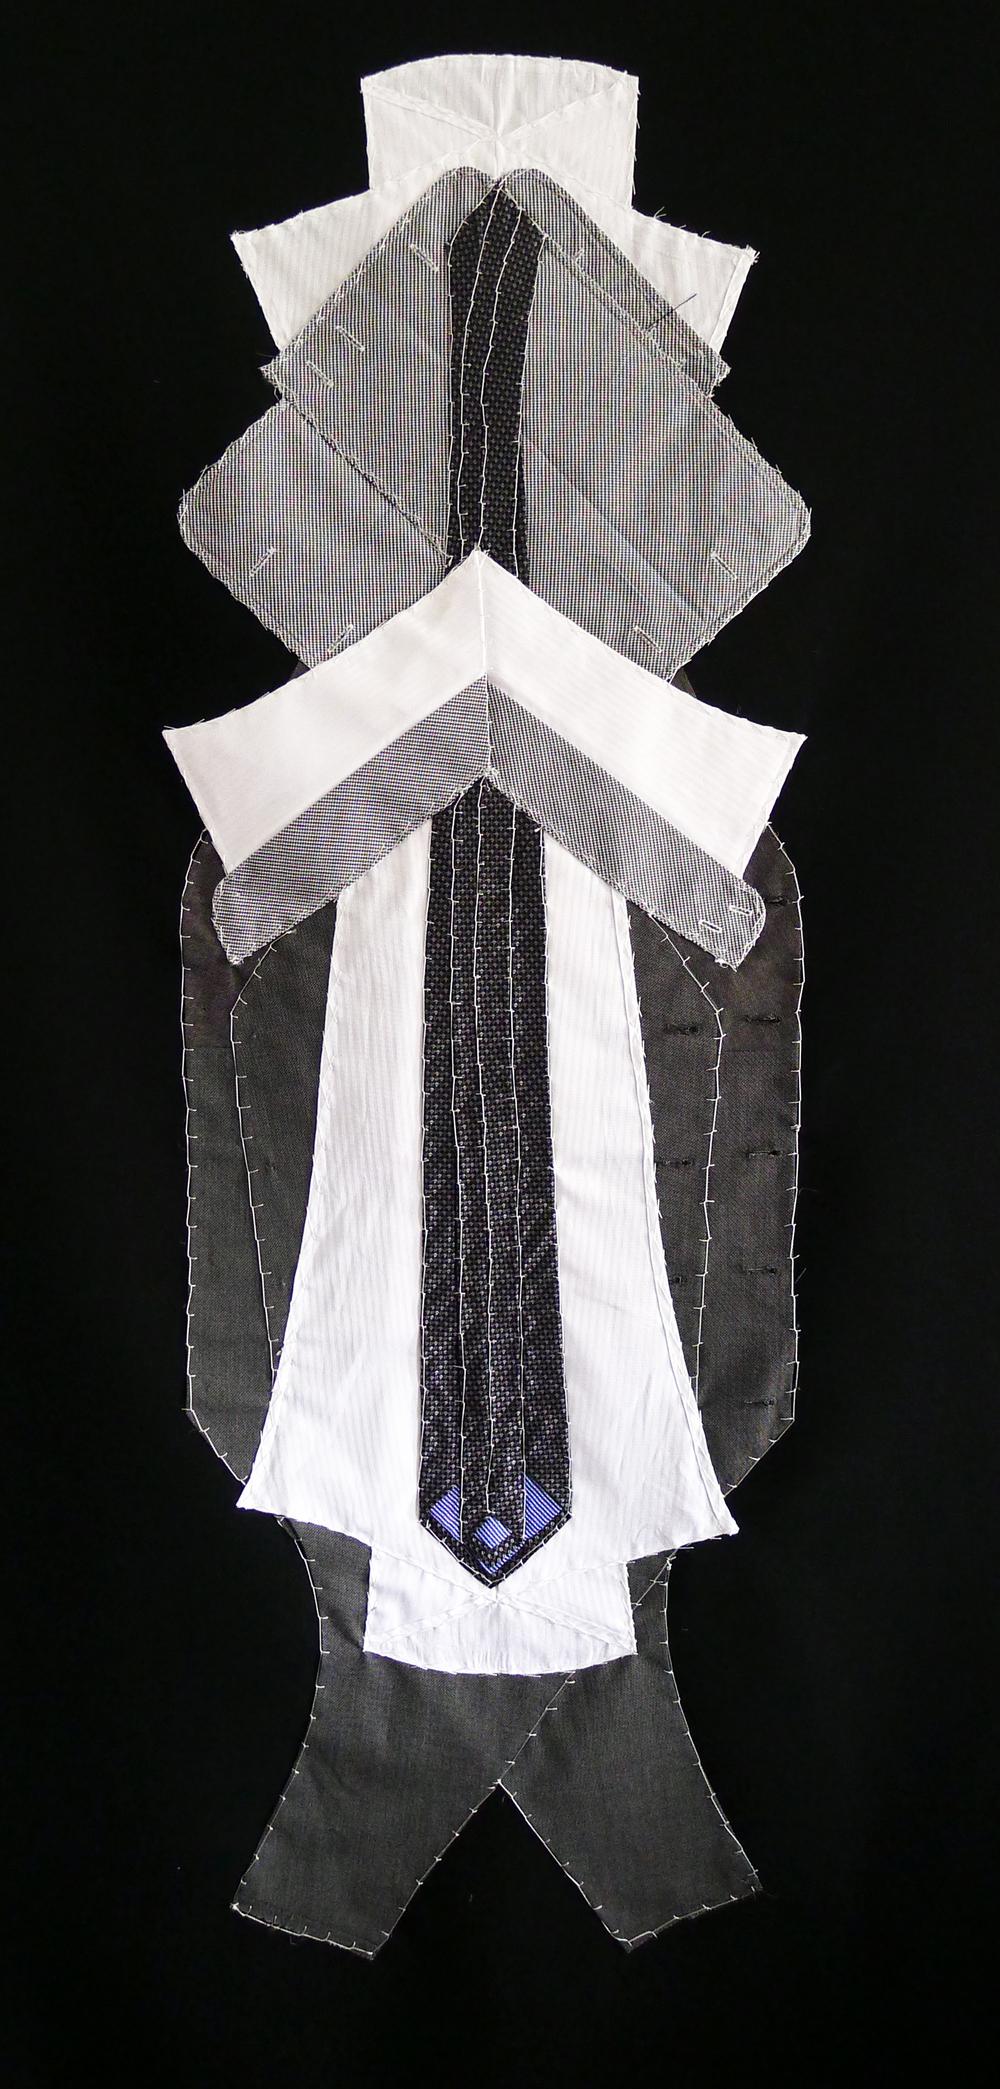 Chaplin - deconstructed tie, vest, shirt tapestry